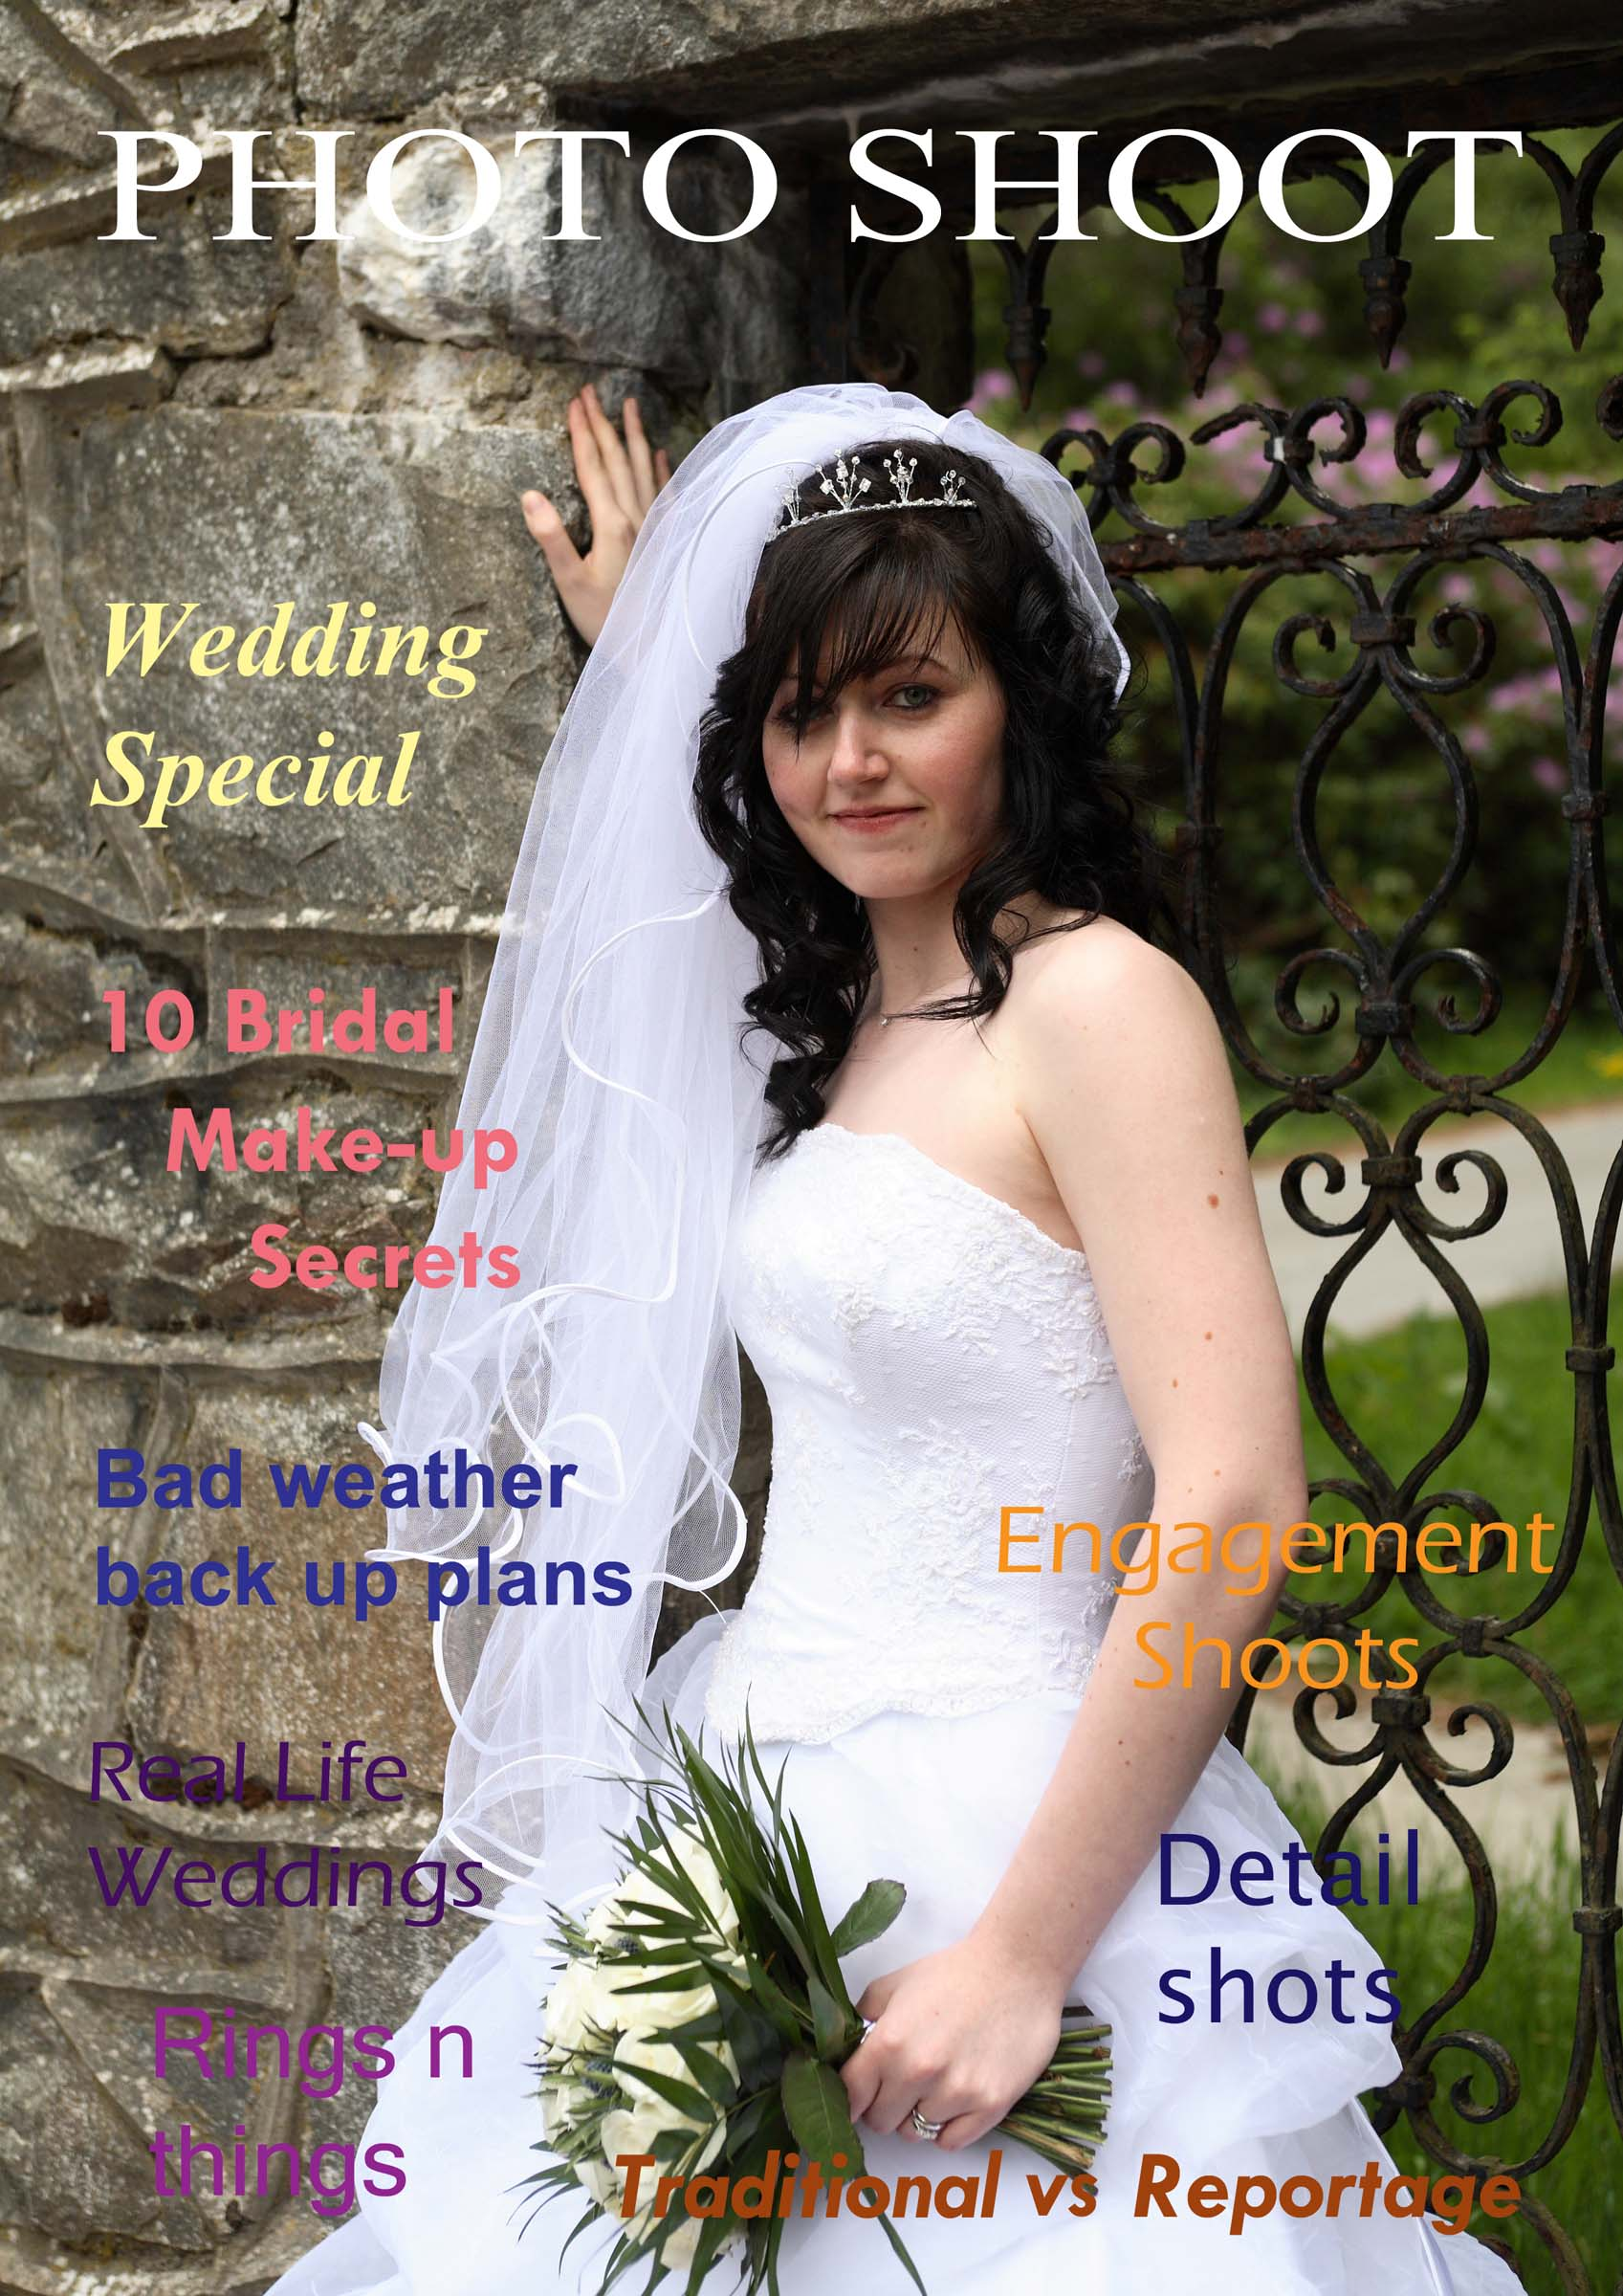 Wedding Photography magazine cover